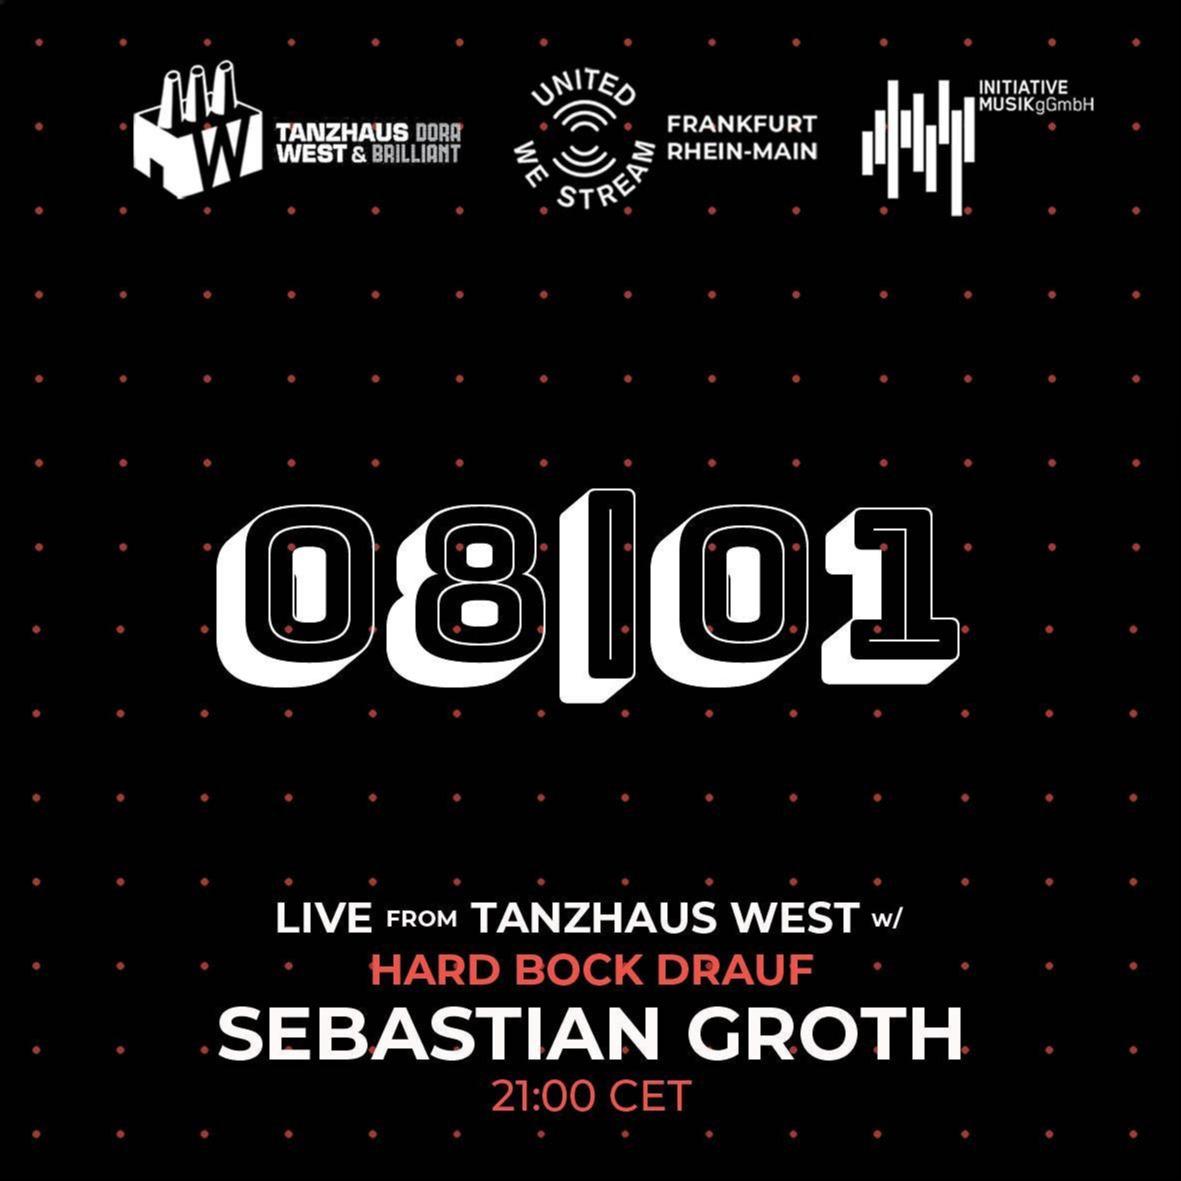 [Stream] Sebastian Groth - United We Stream | Tanzhaus West x Hard Bock Drauf - YouTube